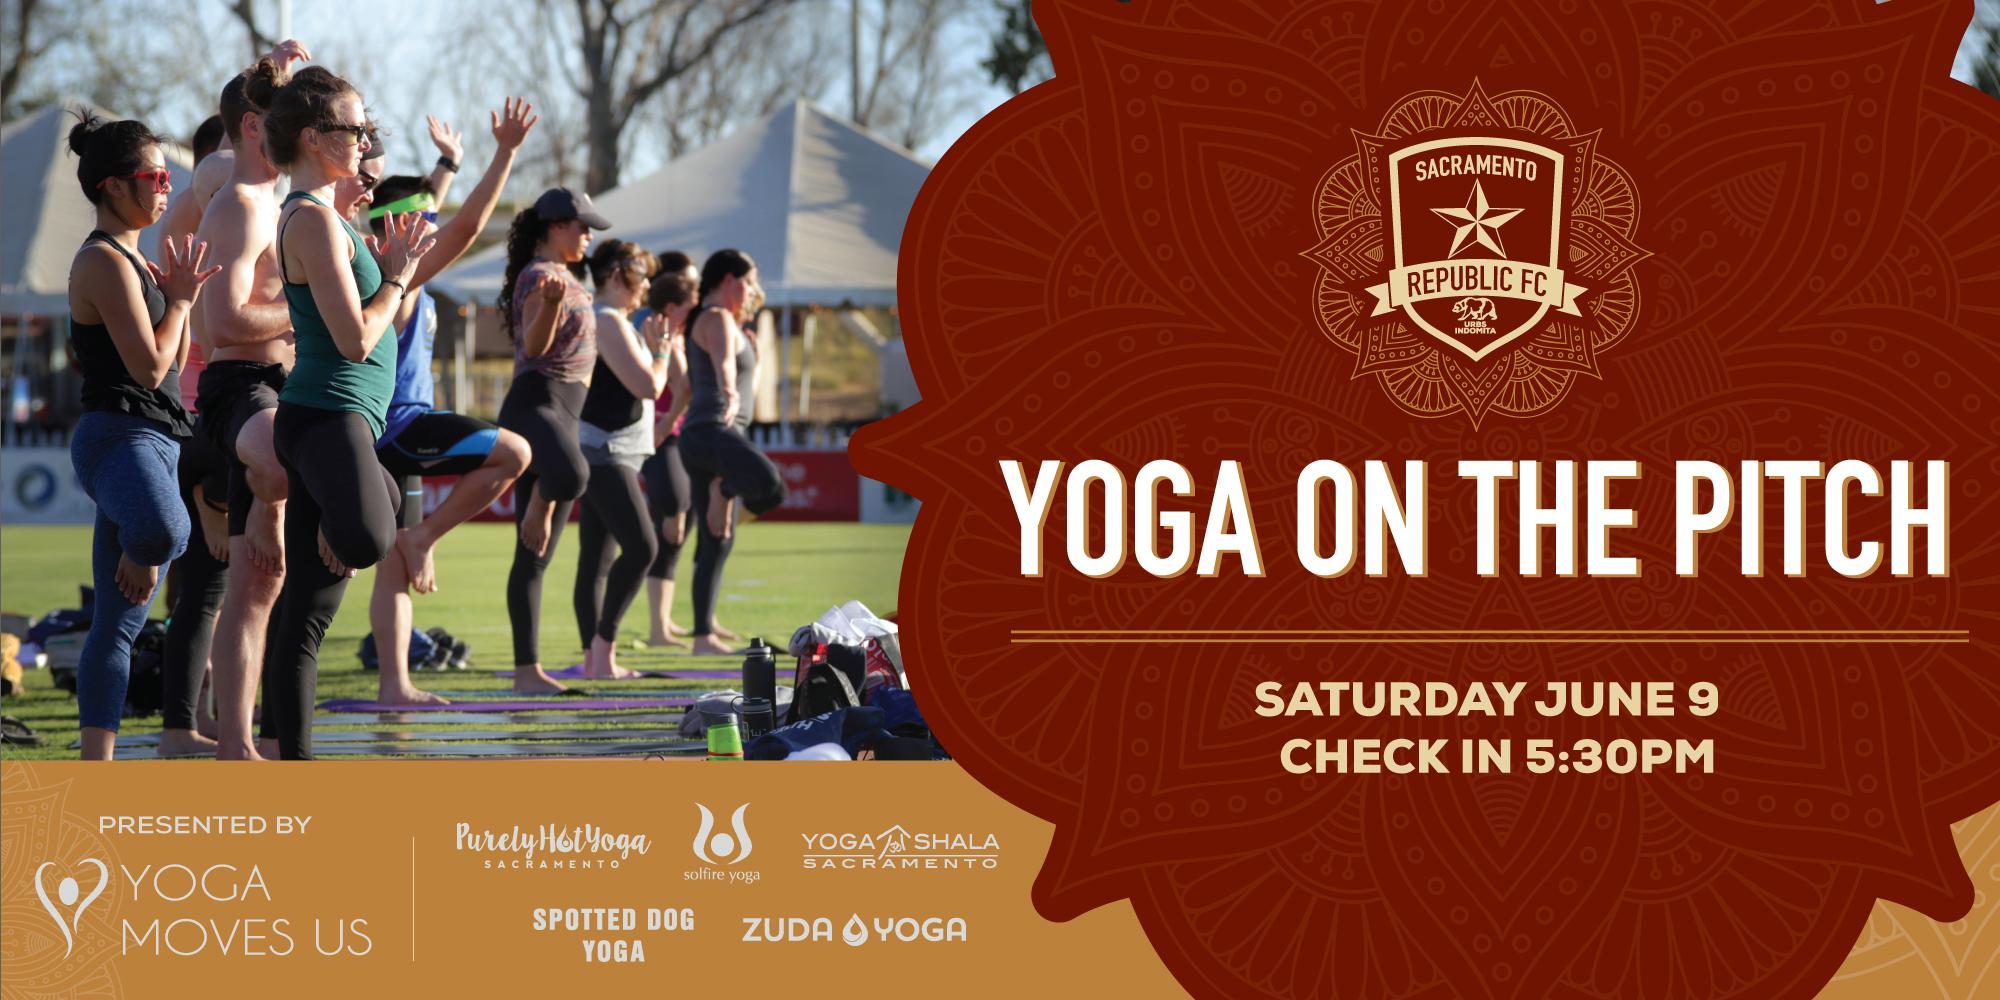 Yoga-on-the-pitch,-2000x1000.jpg